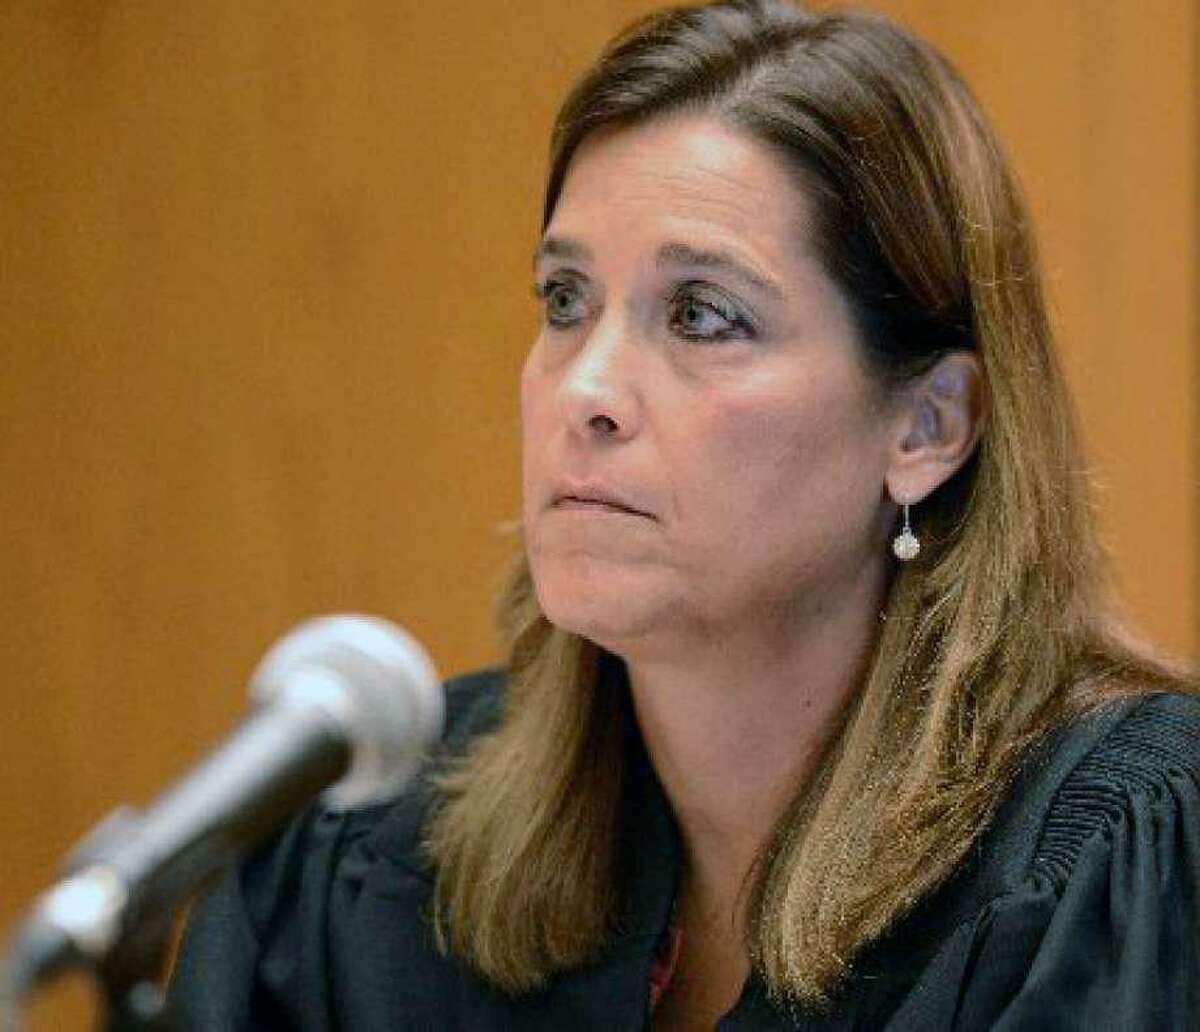 State Superior Court Judge Barbara Bellis